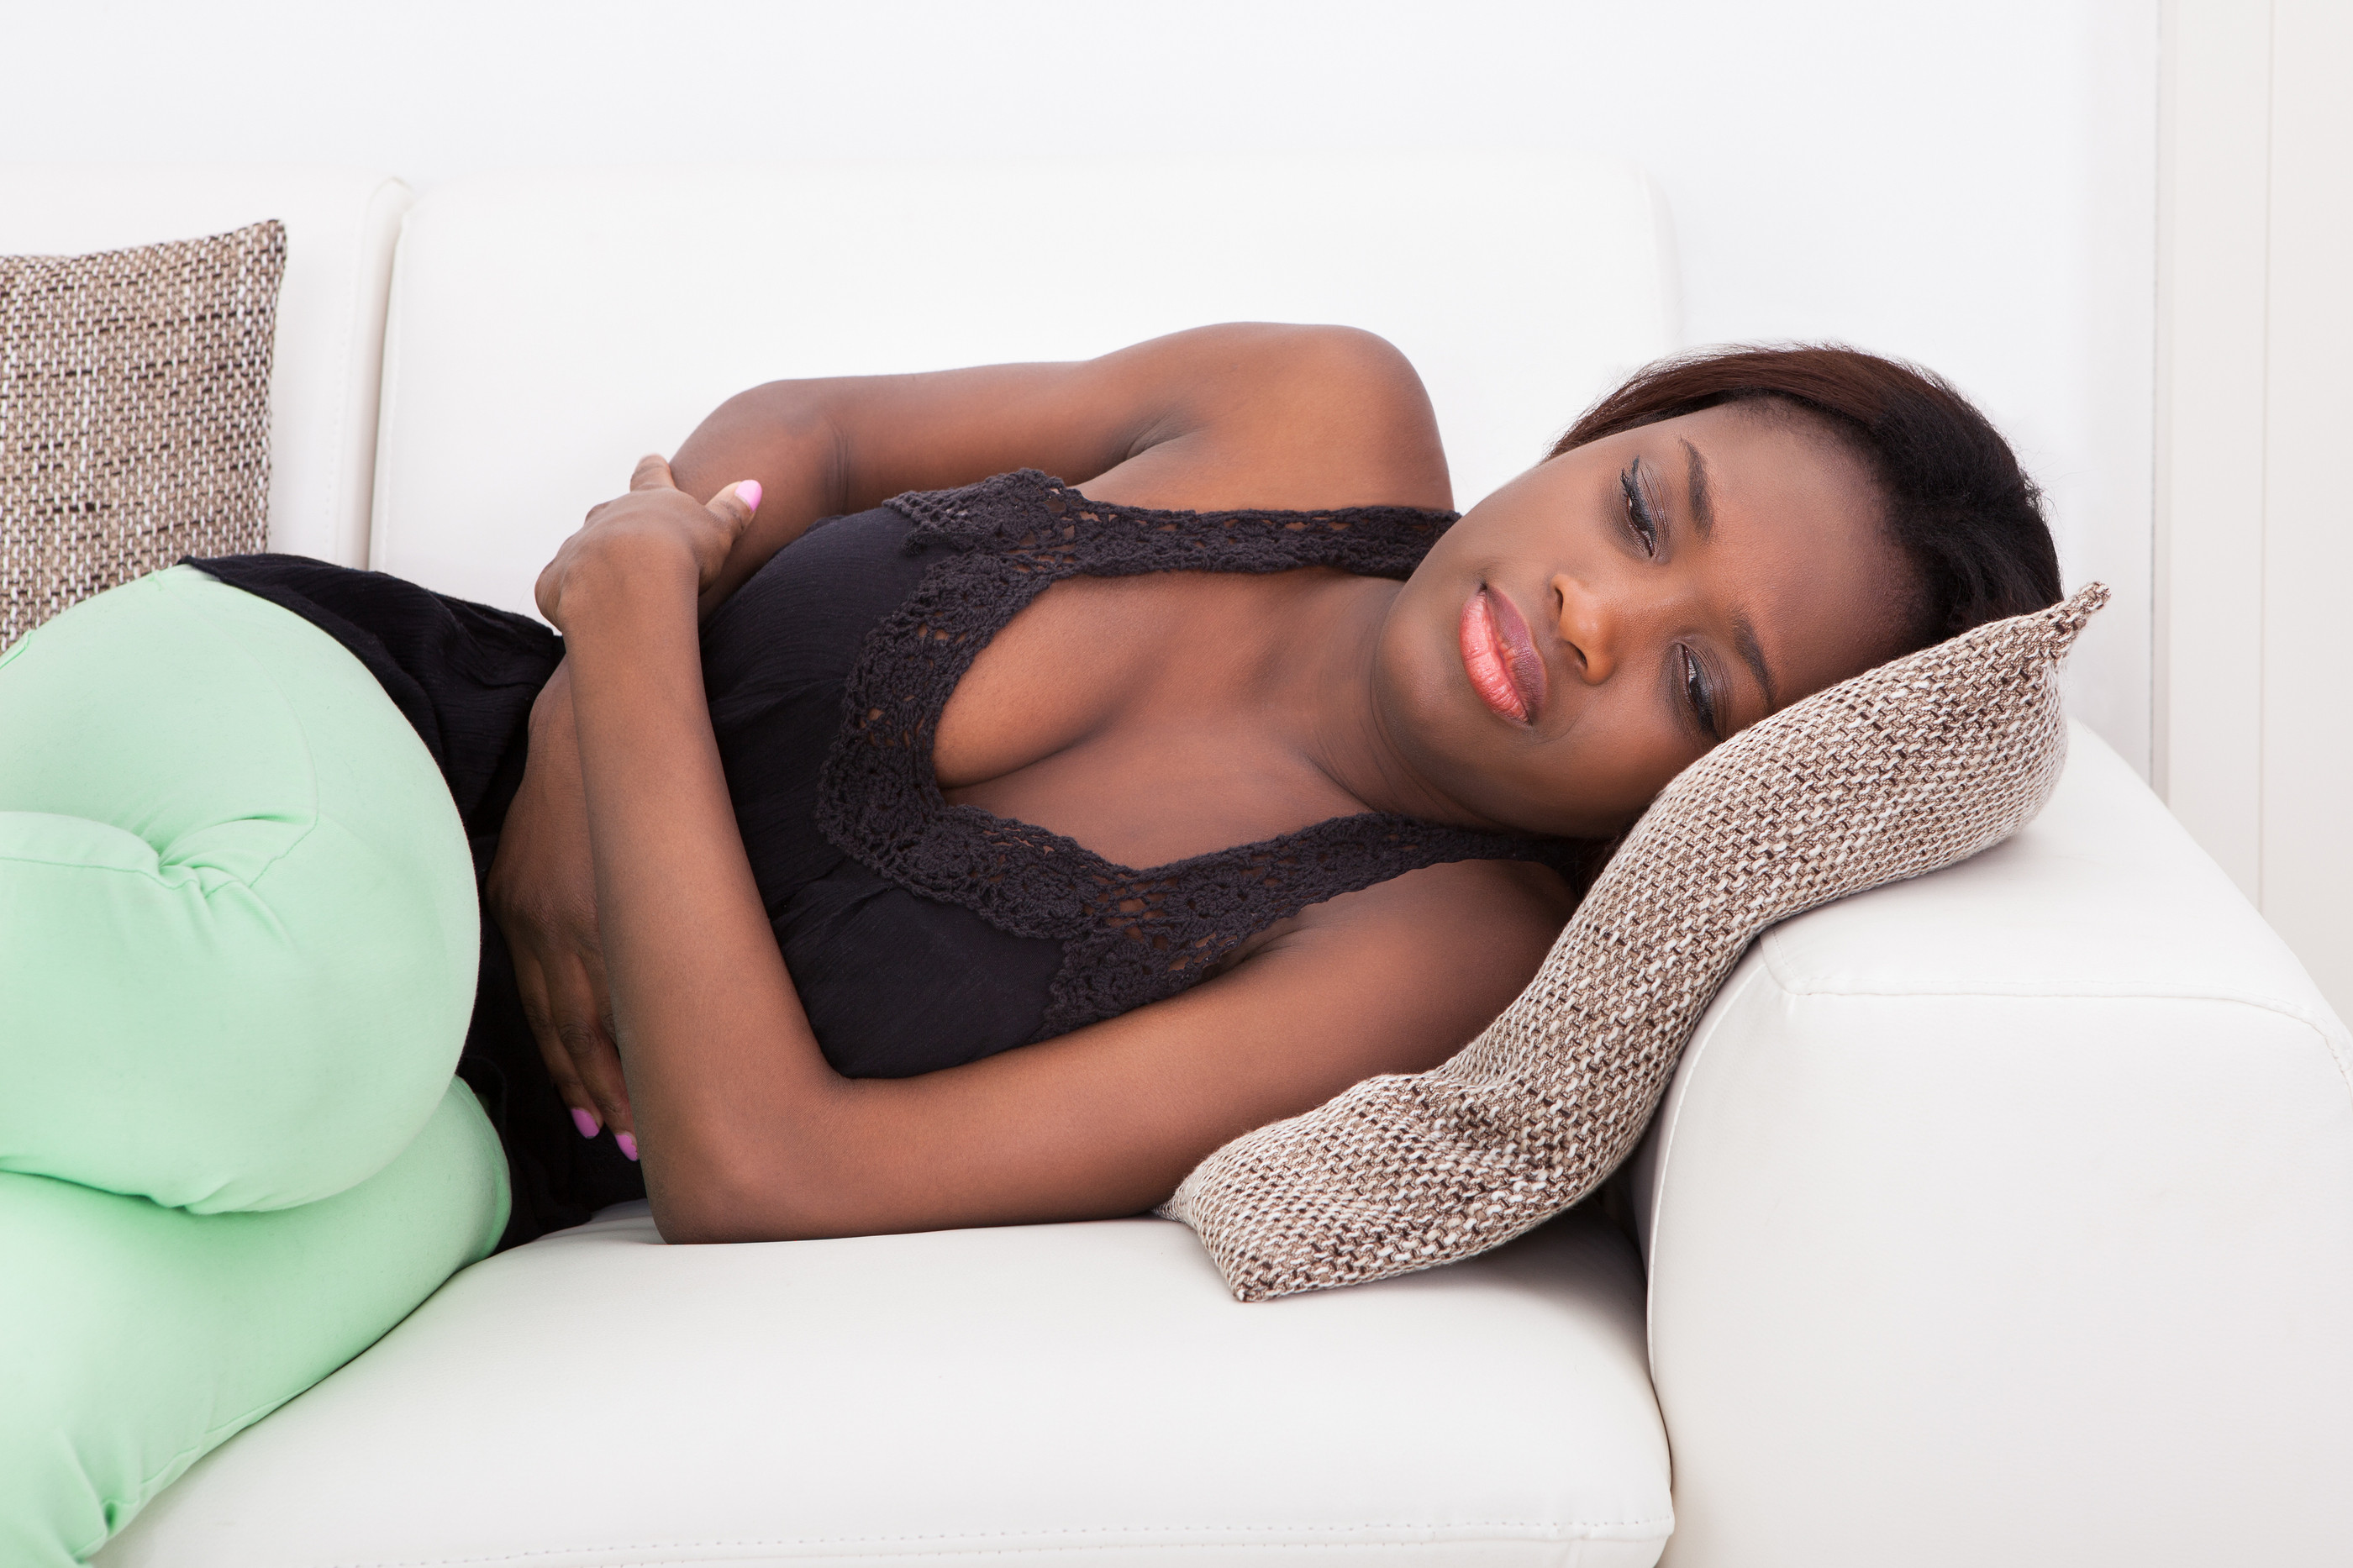 bigstock-Woman-Suffering-stomach-pain-cramps-70891861